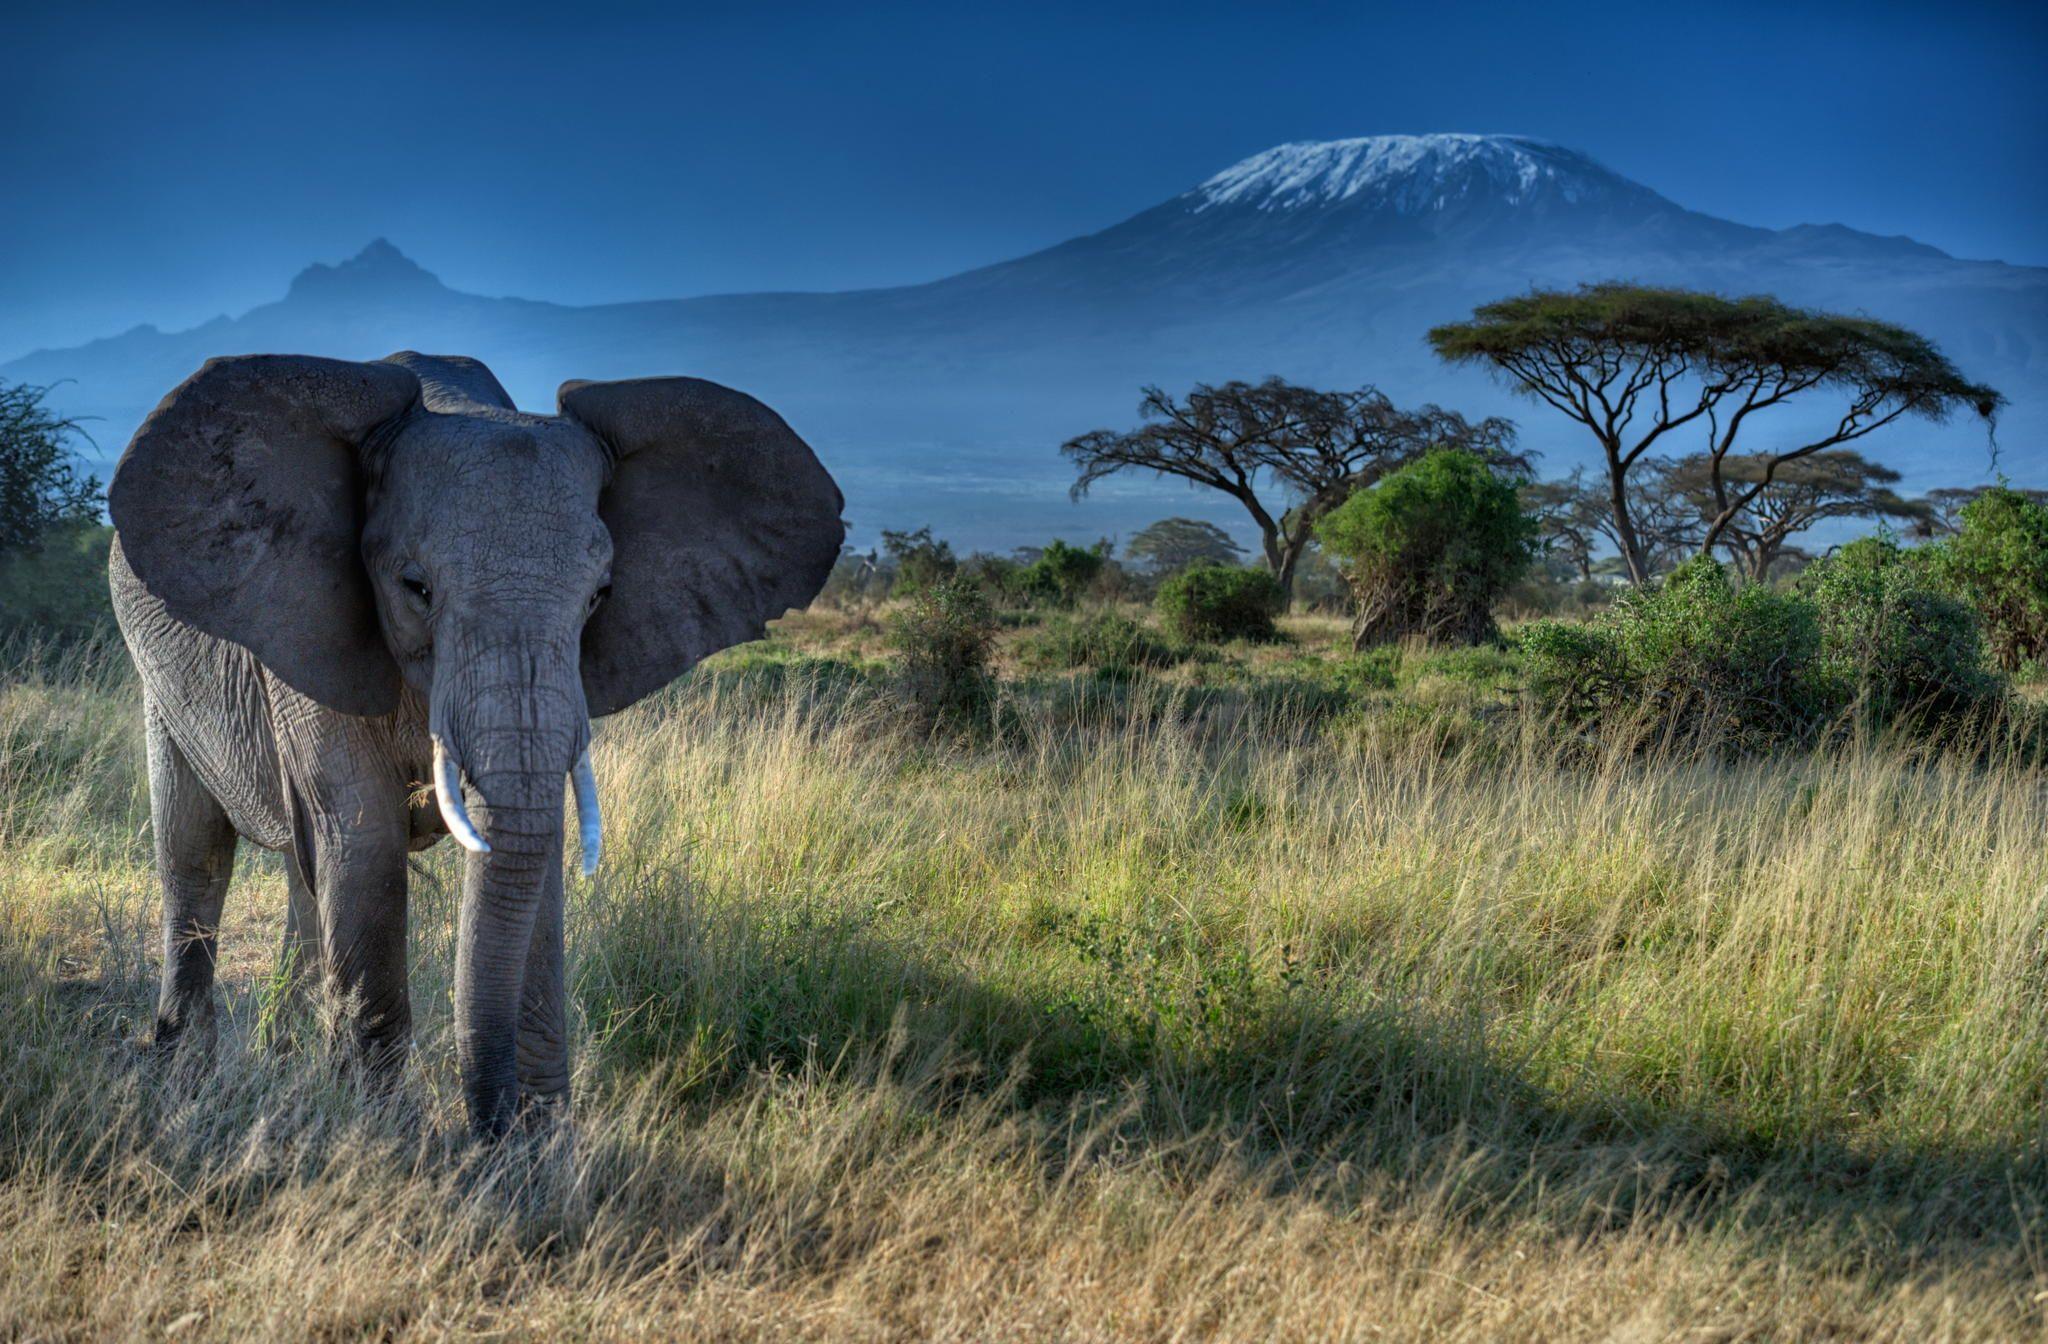 Photograph Elephant And Mt Kilimanjaro Amboseli National Park Kenya By Diana Robinson On 500px Elephant Wallpaper Elephant Elephant Background